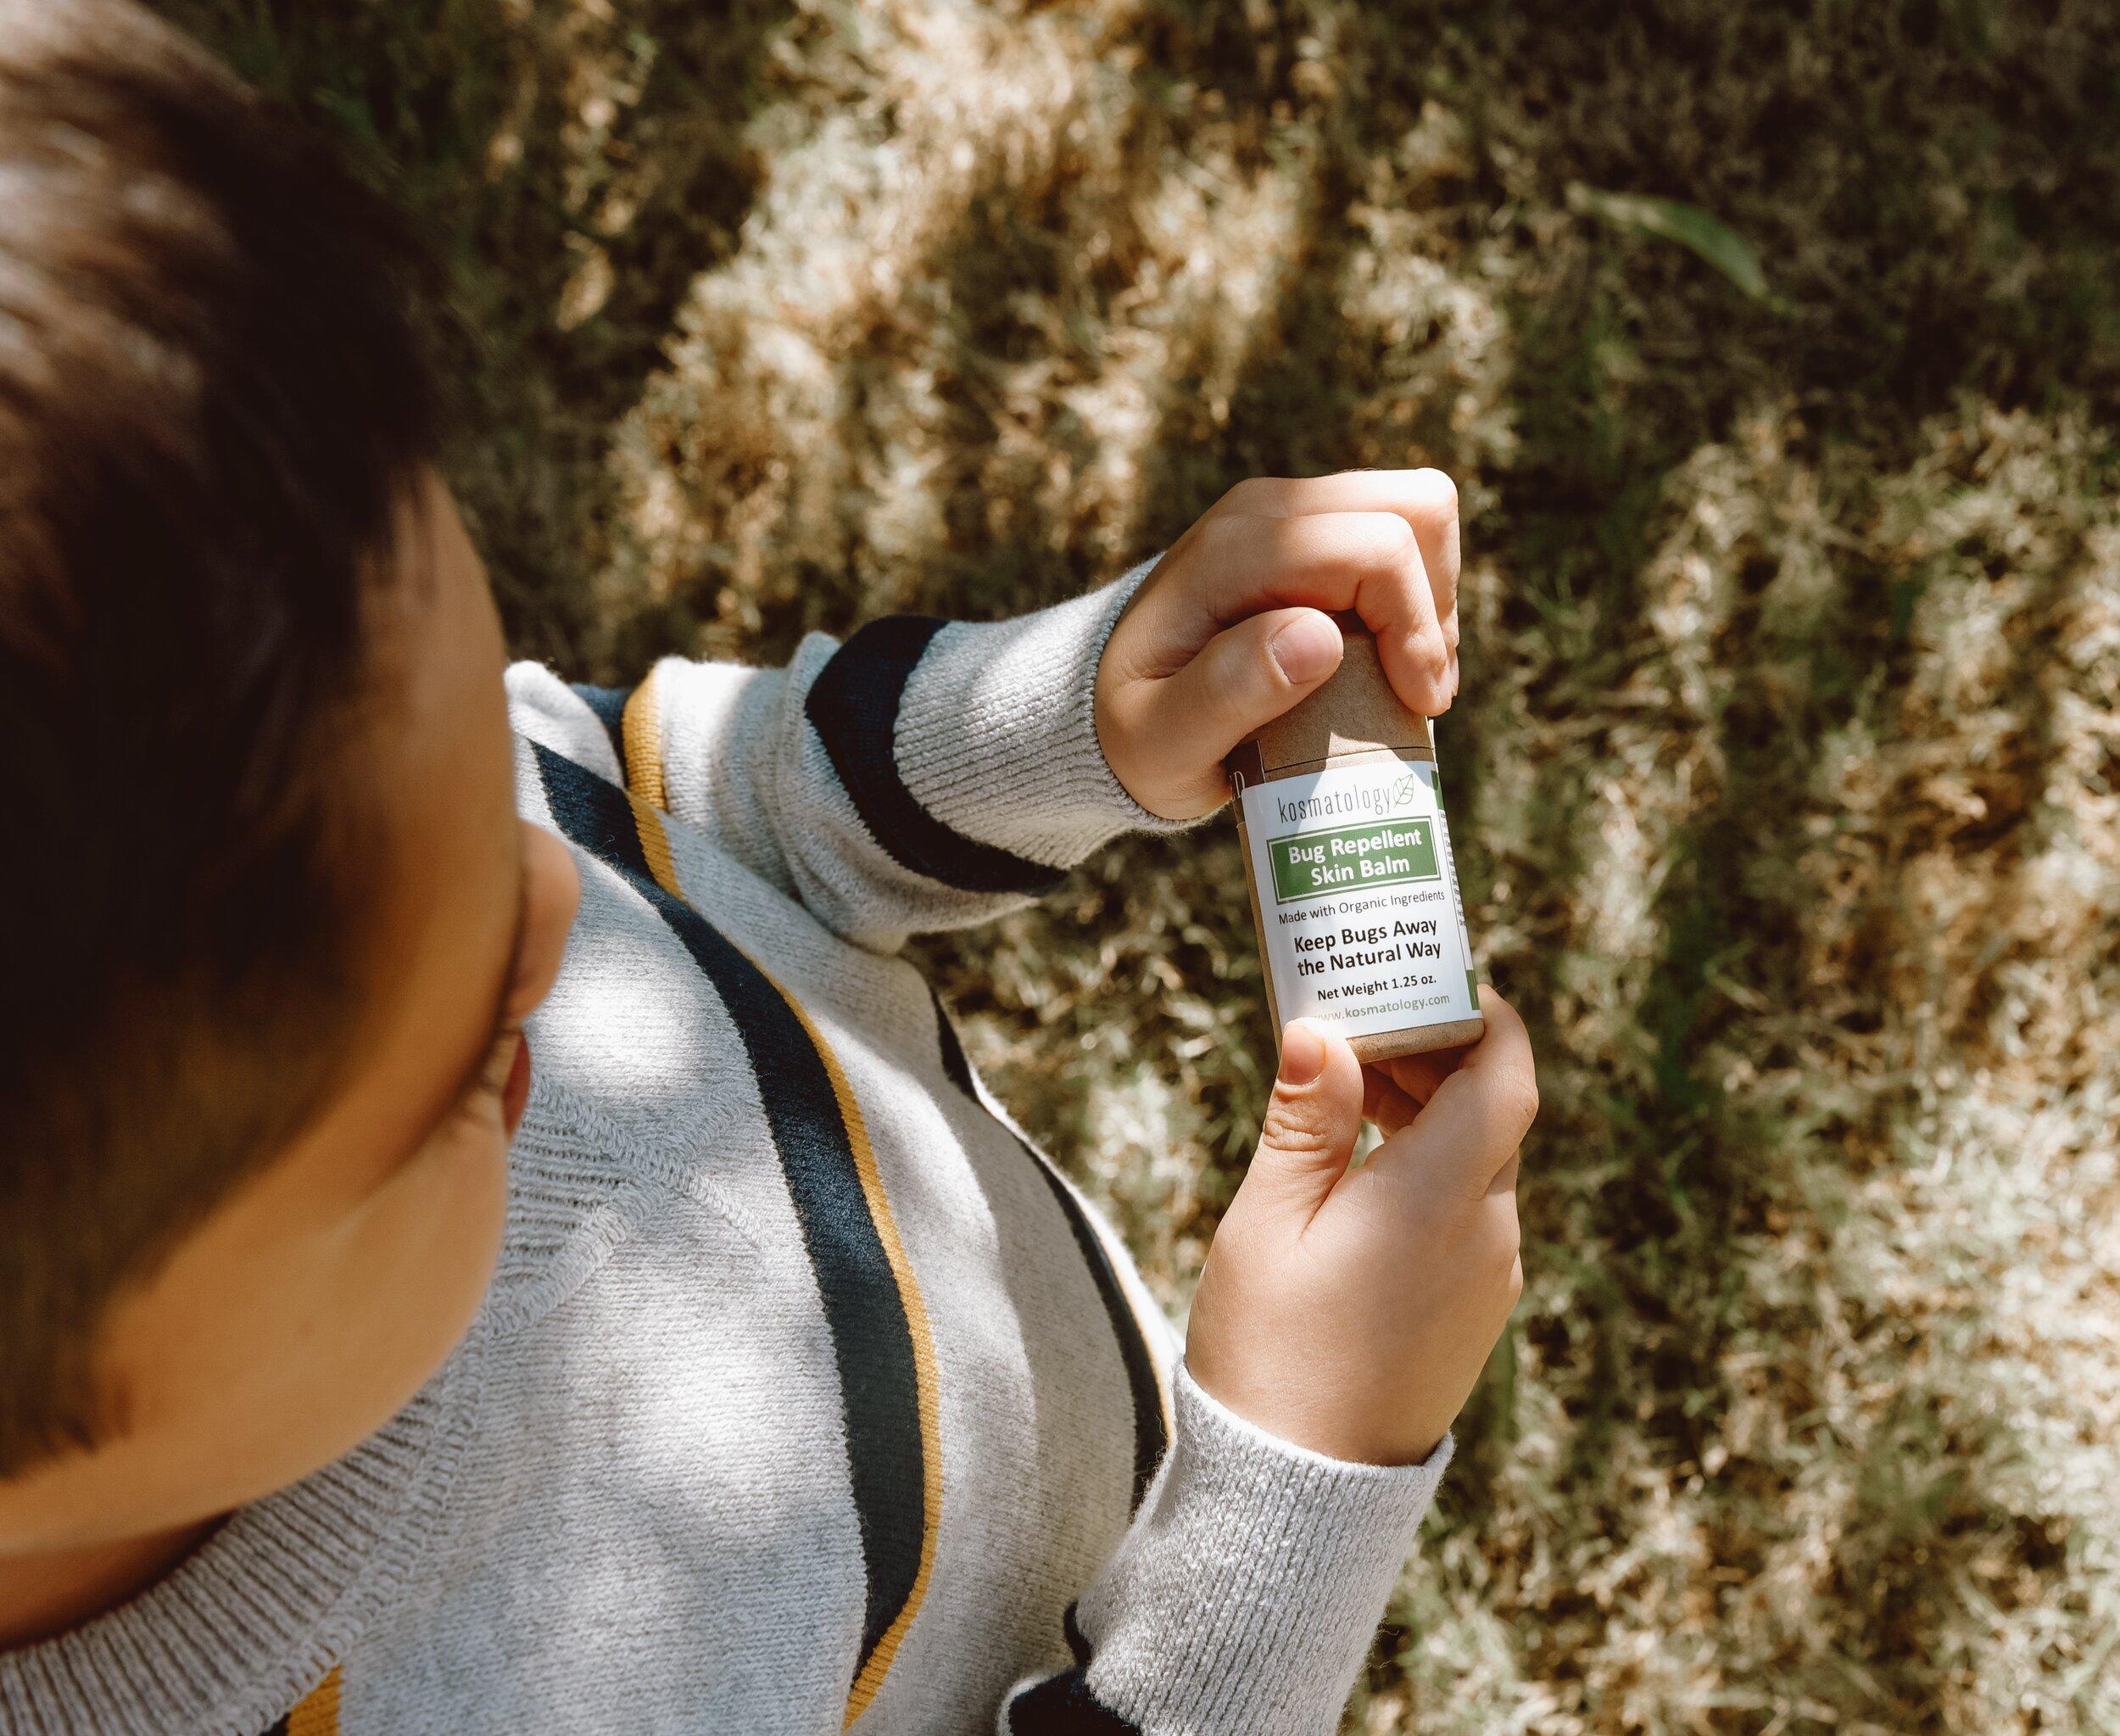 Young boy, standing outside, holding Kosmatology Bug Balm.